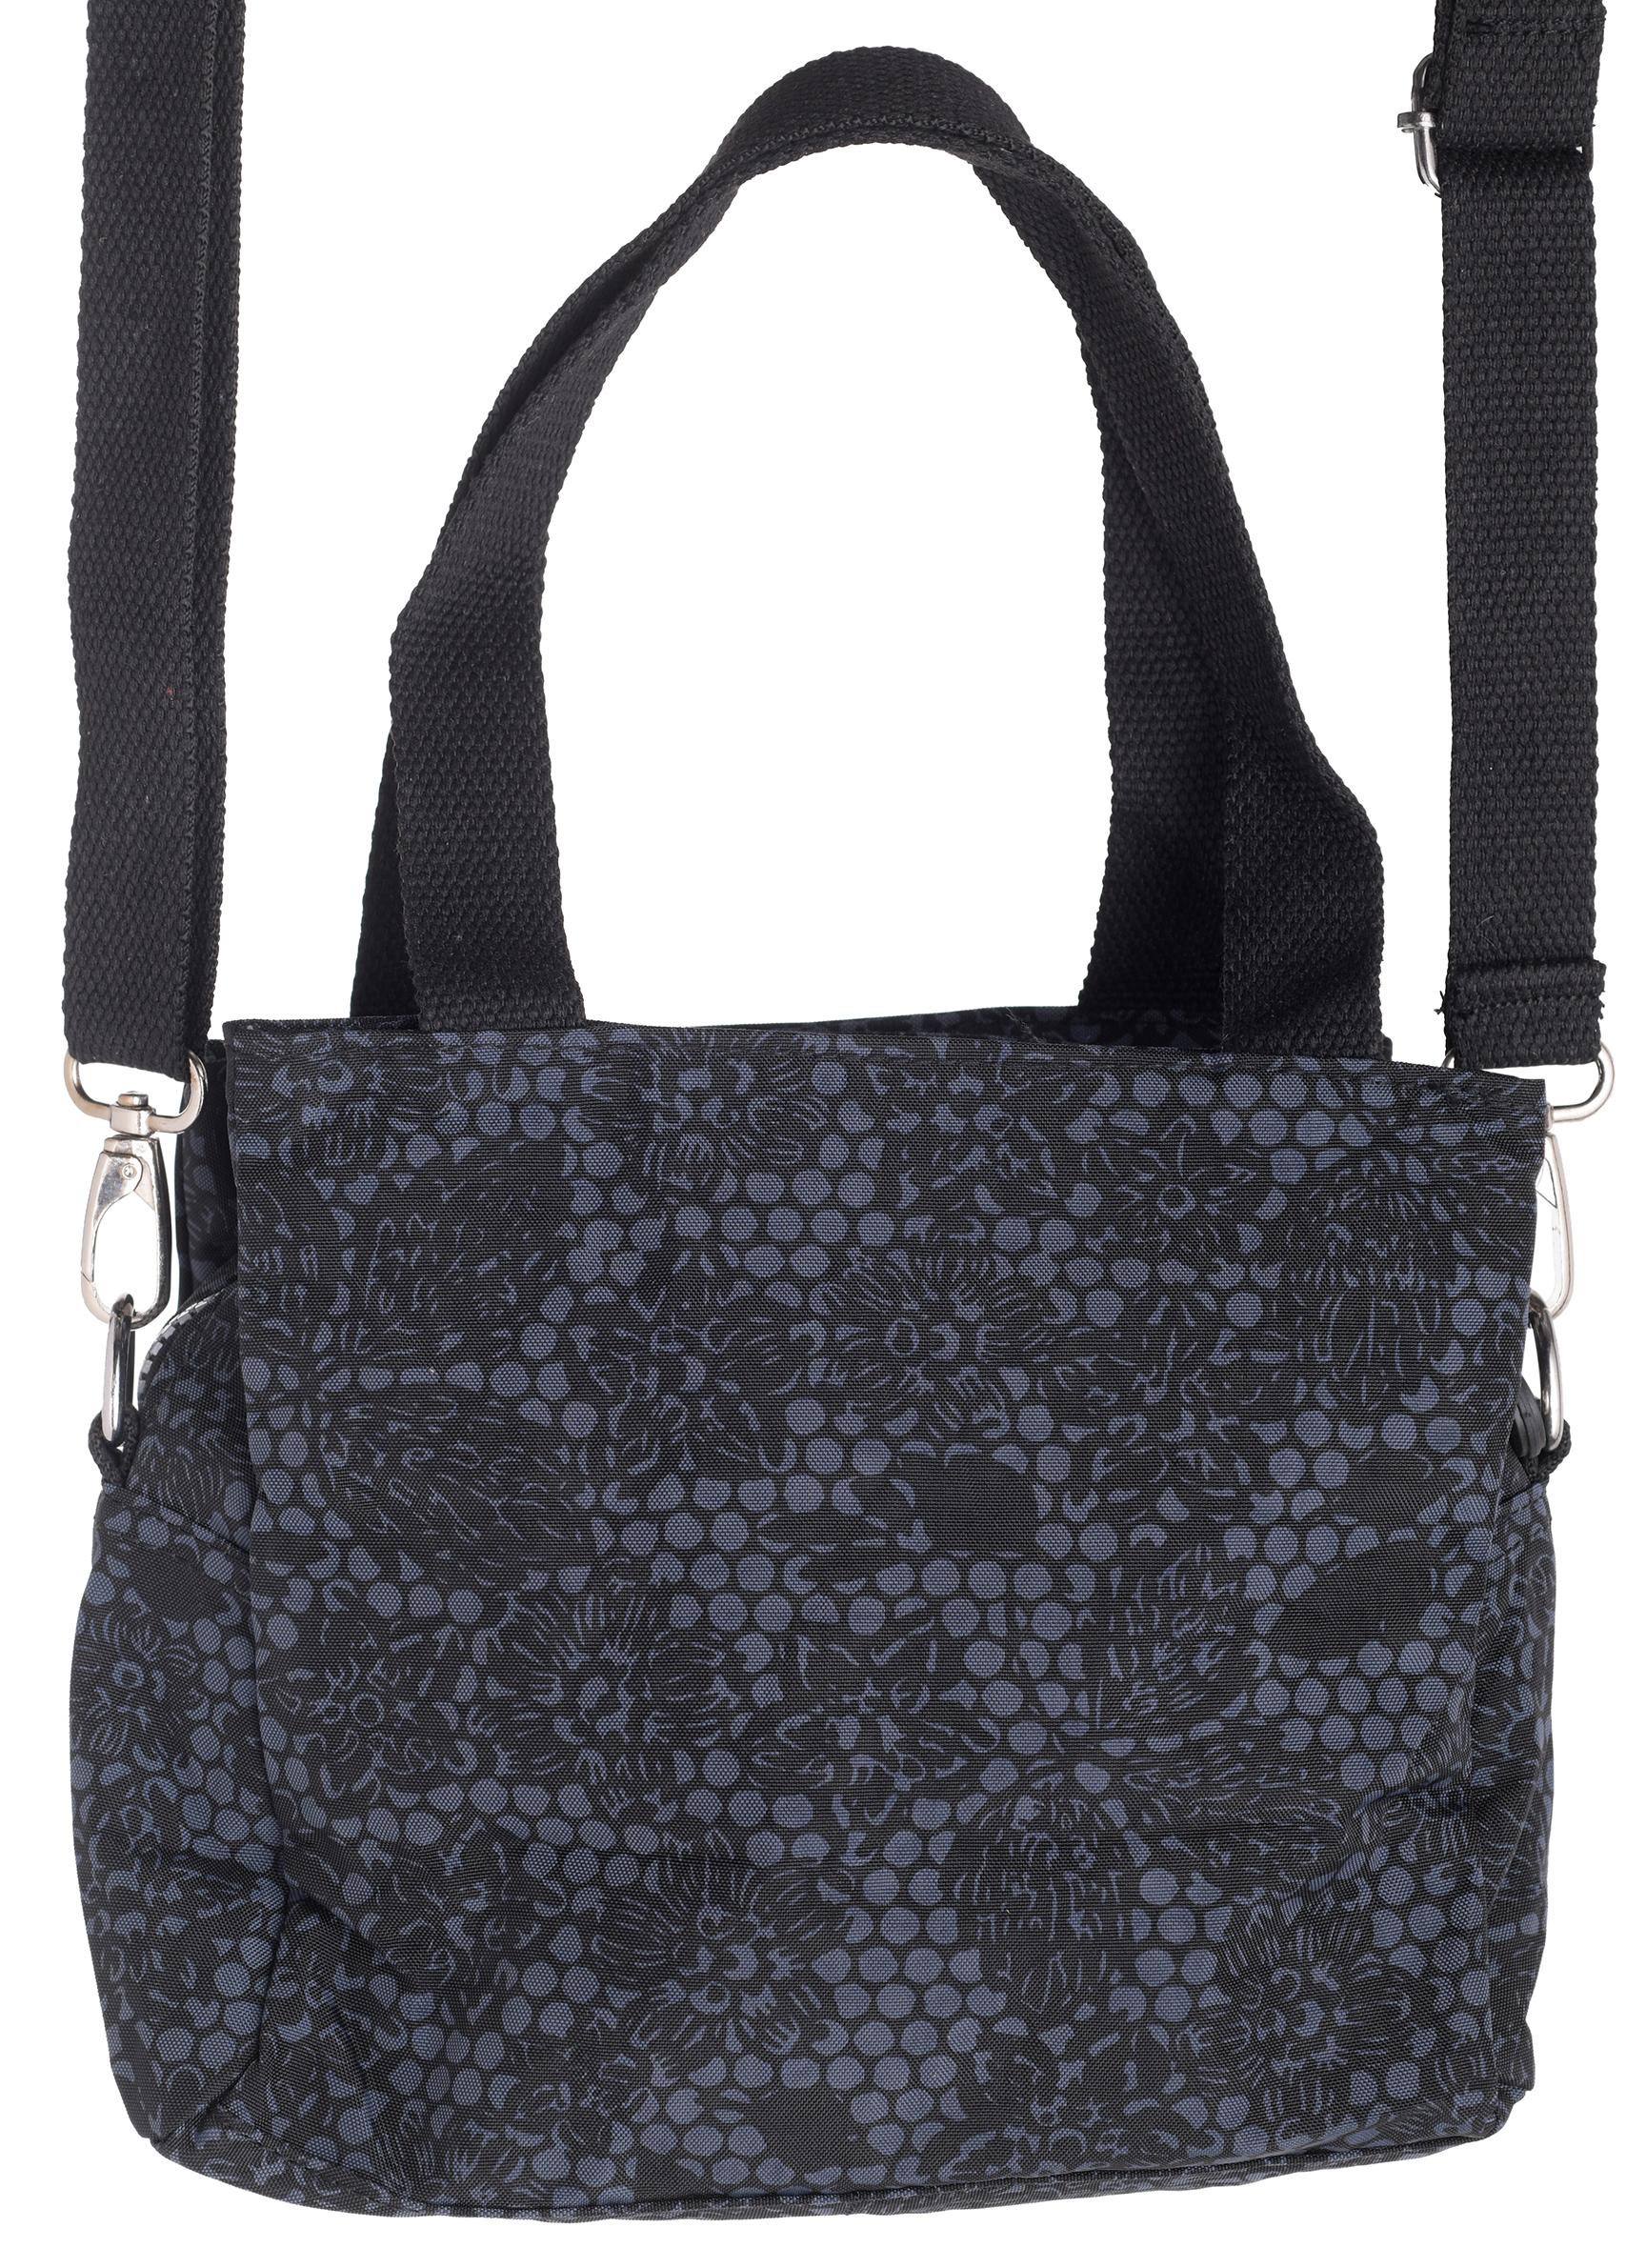 Ladies-Assorted-Pattern-Lightweight-Handbag-Detachable-Shoulder-Strap- bd3d7e43547f8